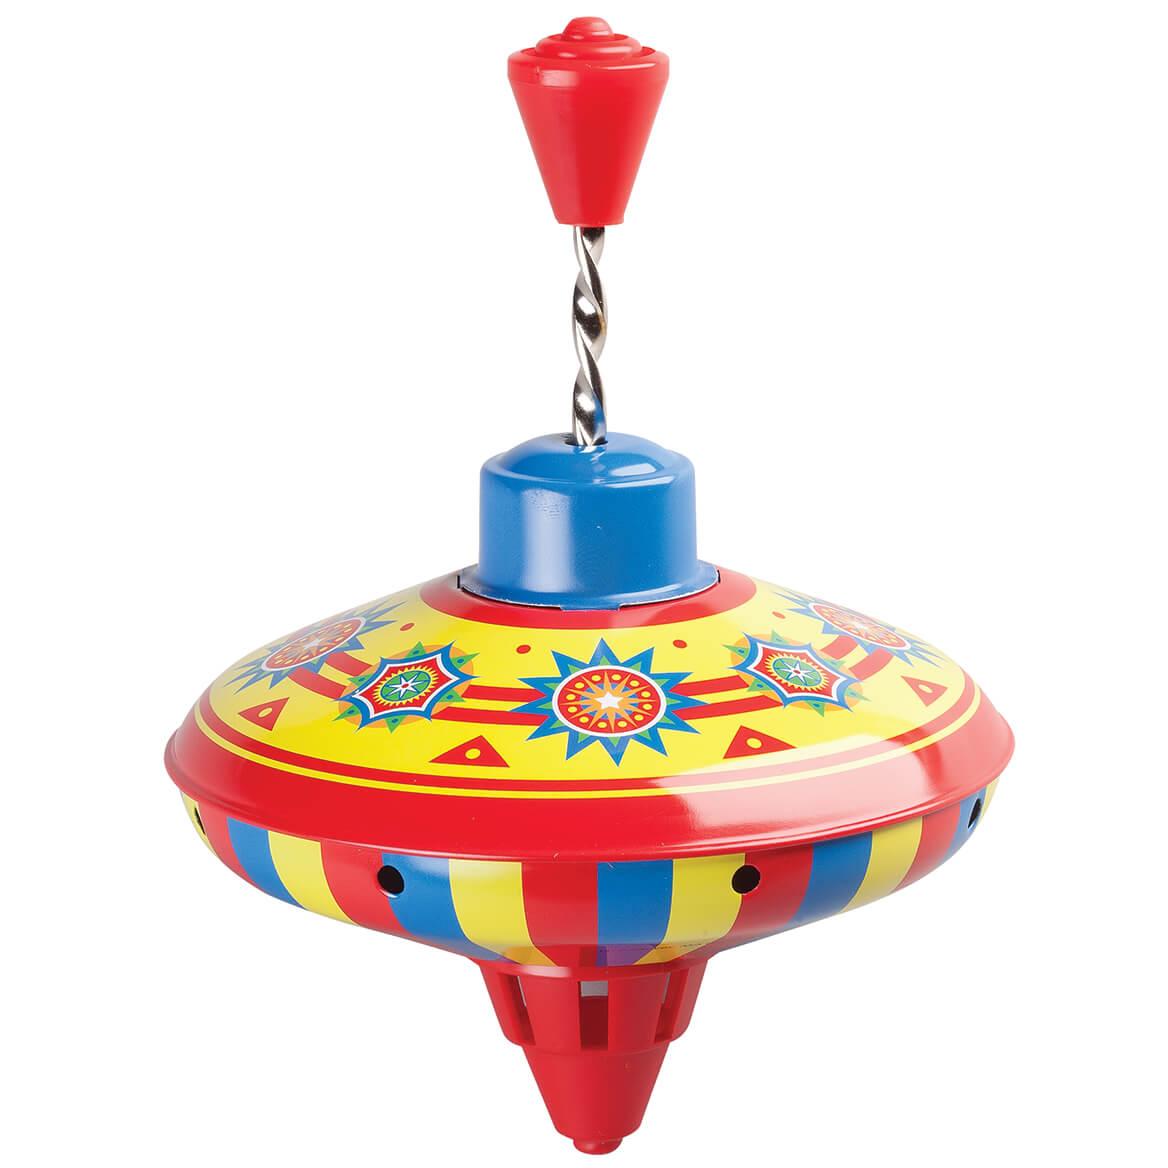 Spinning Tin Top-364516